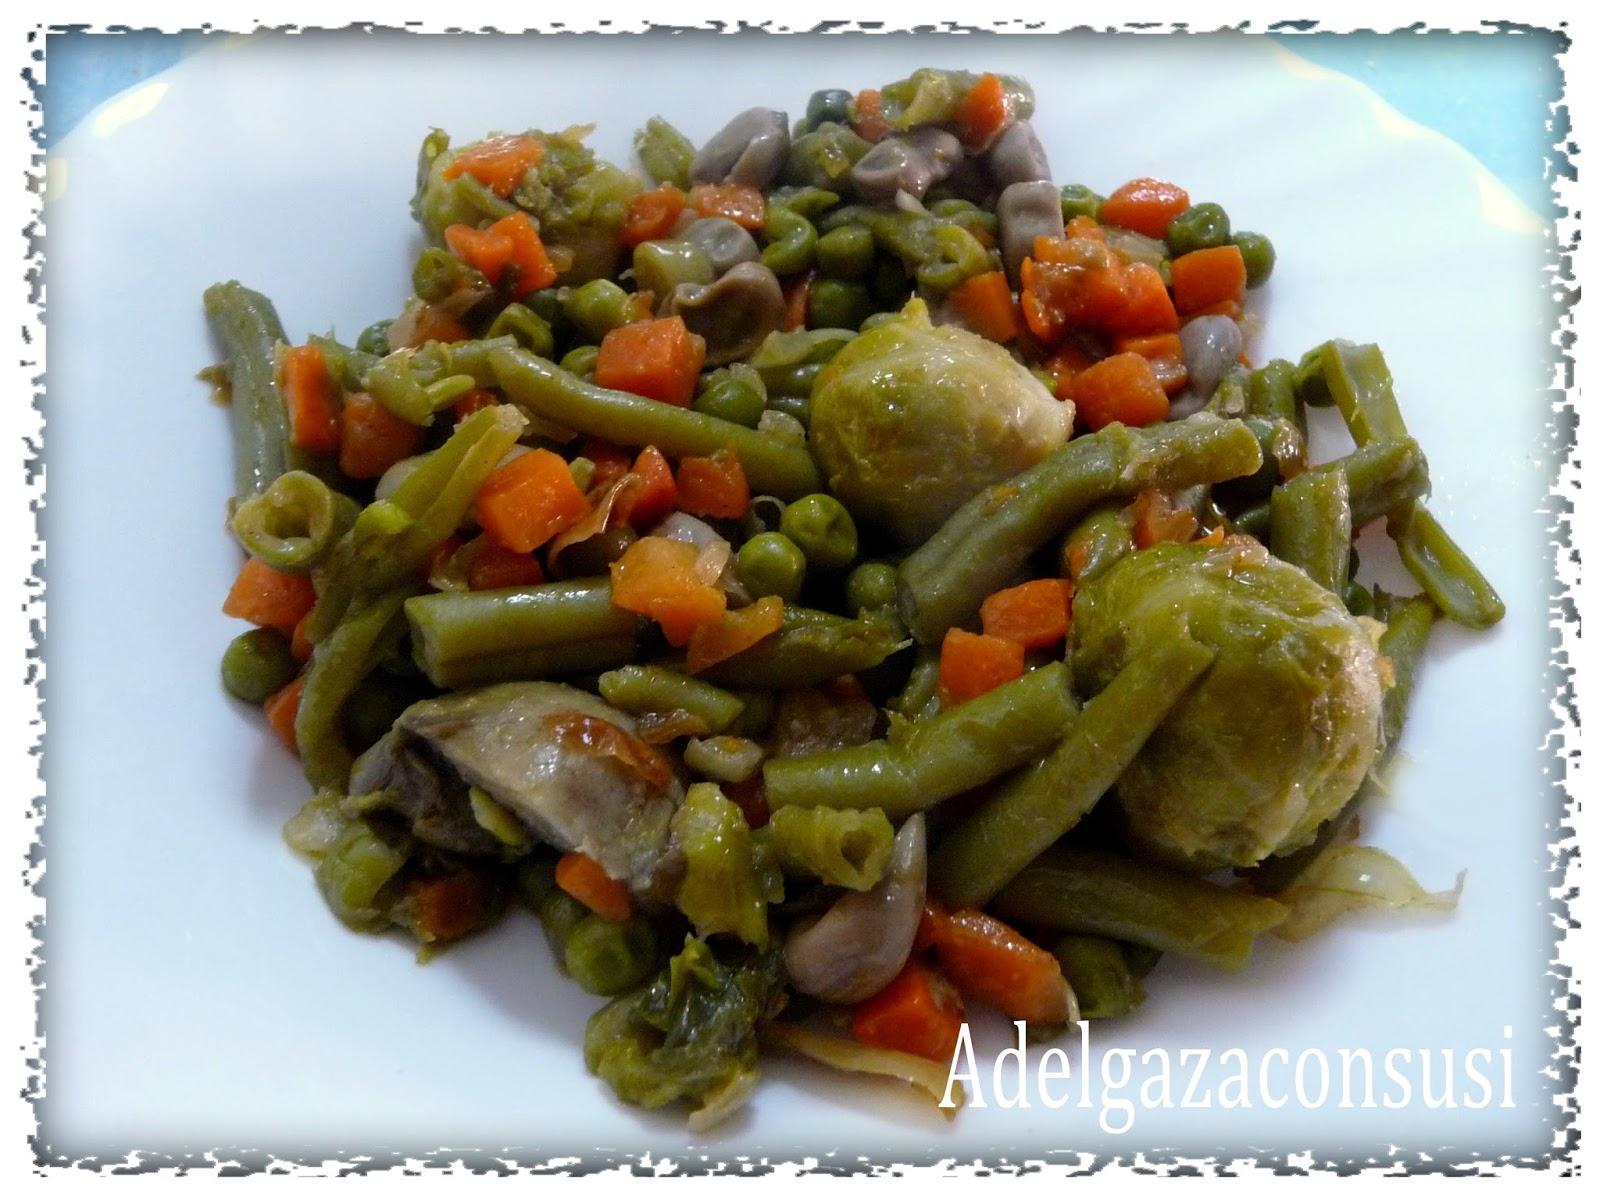 Recetas light adelgazaconsusi menestra de verduras muy - Como preparar menestra de verduras ...